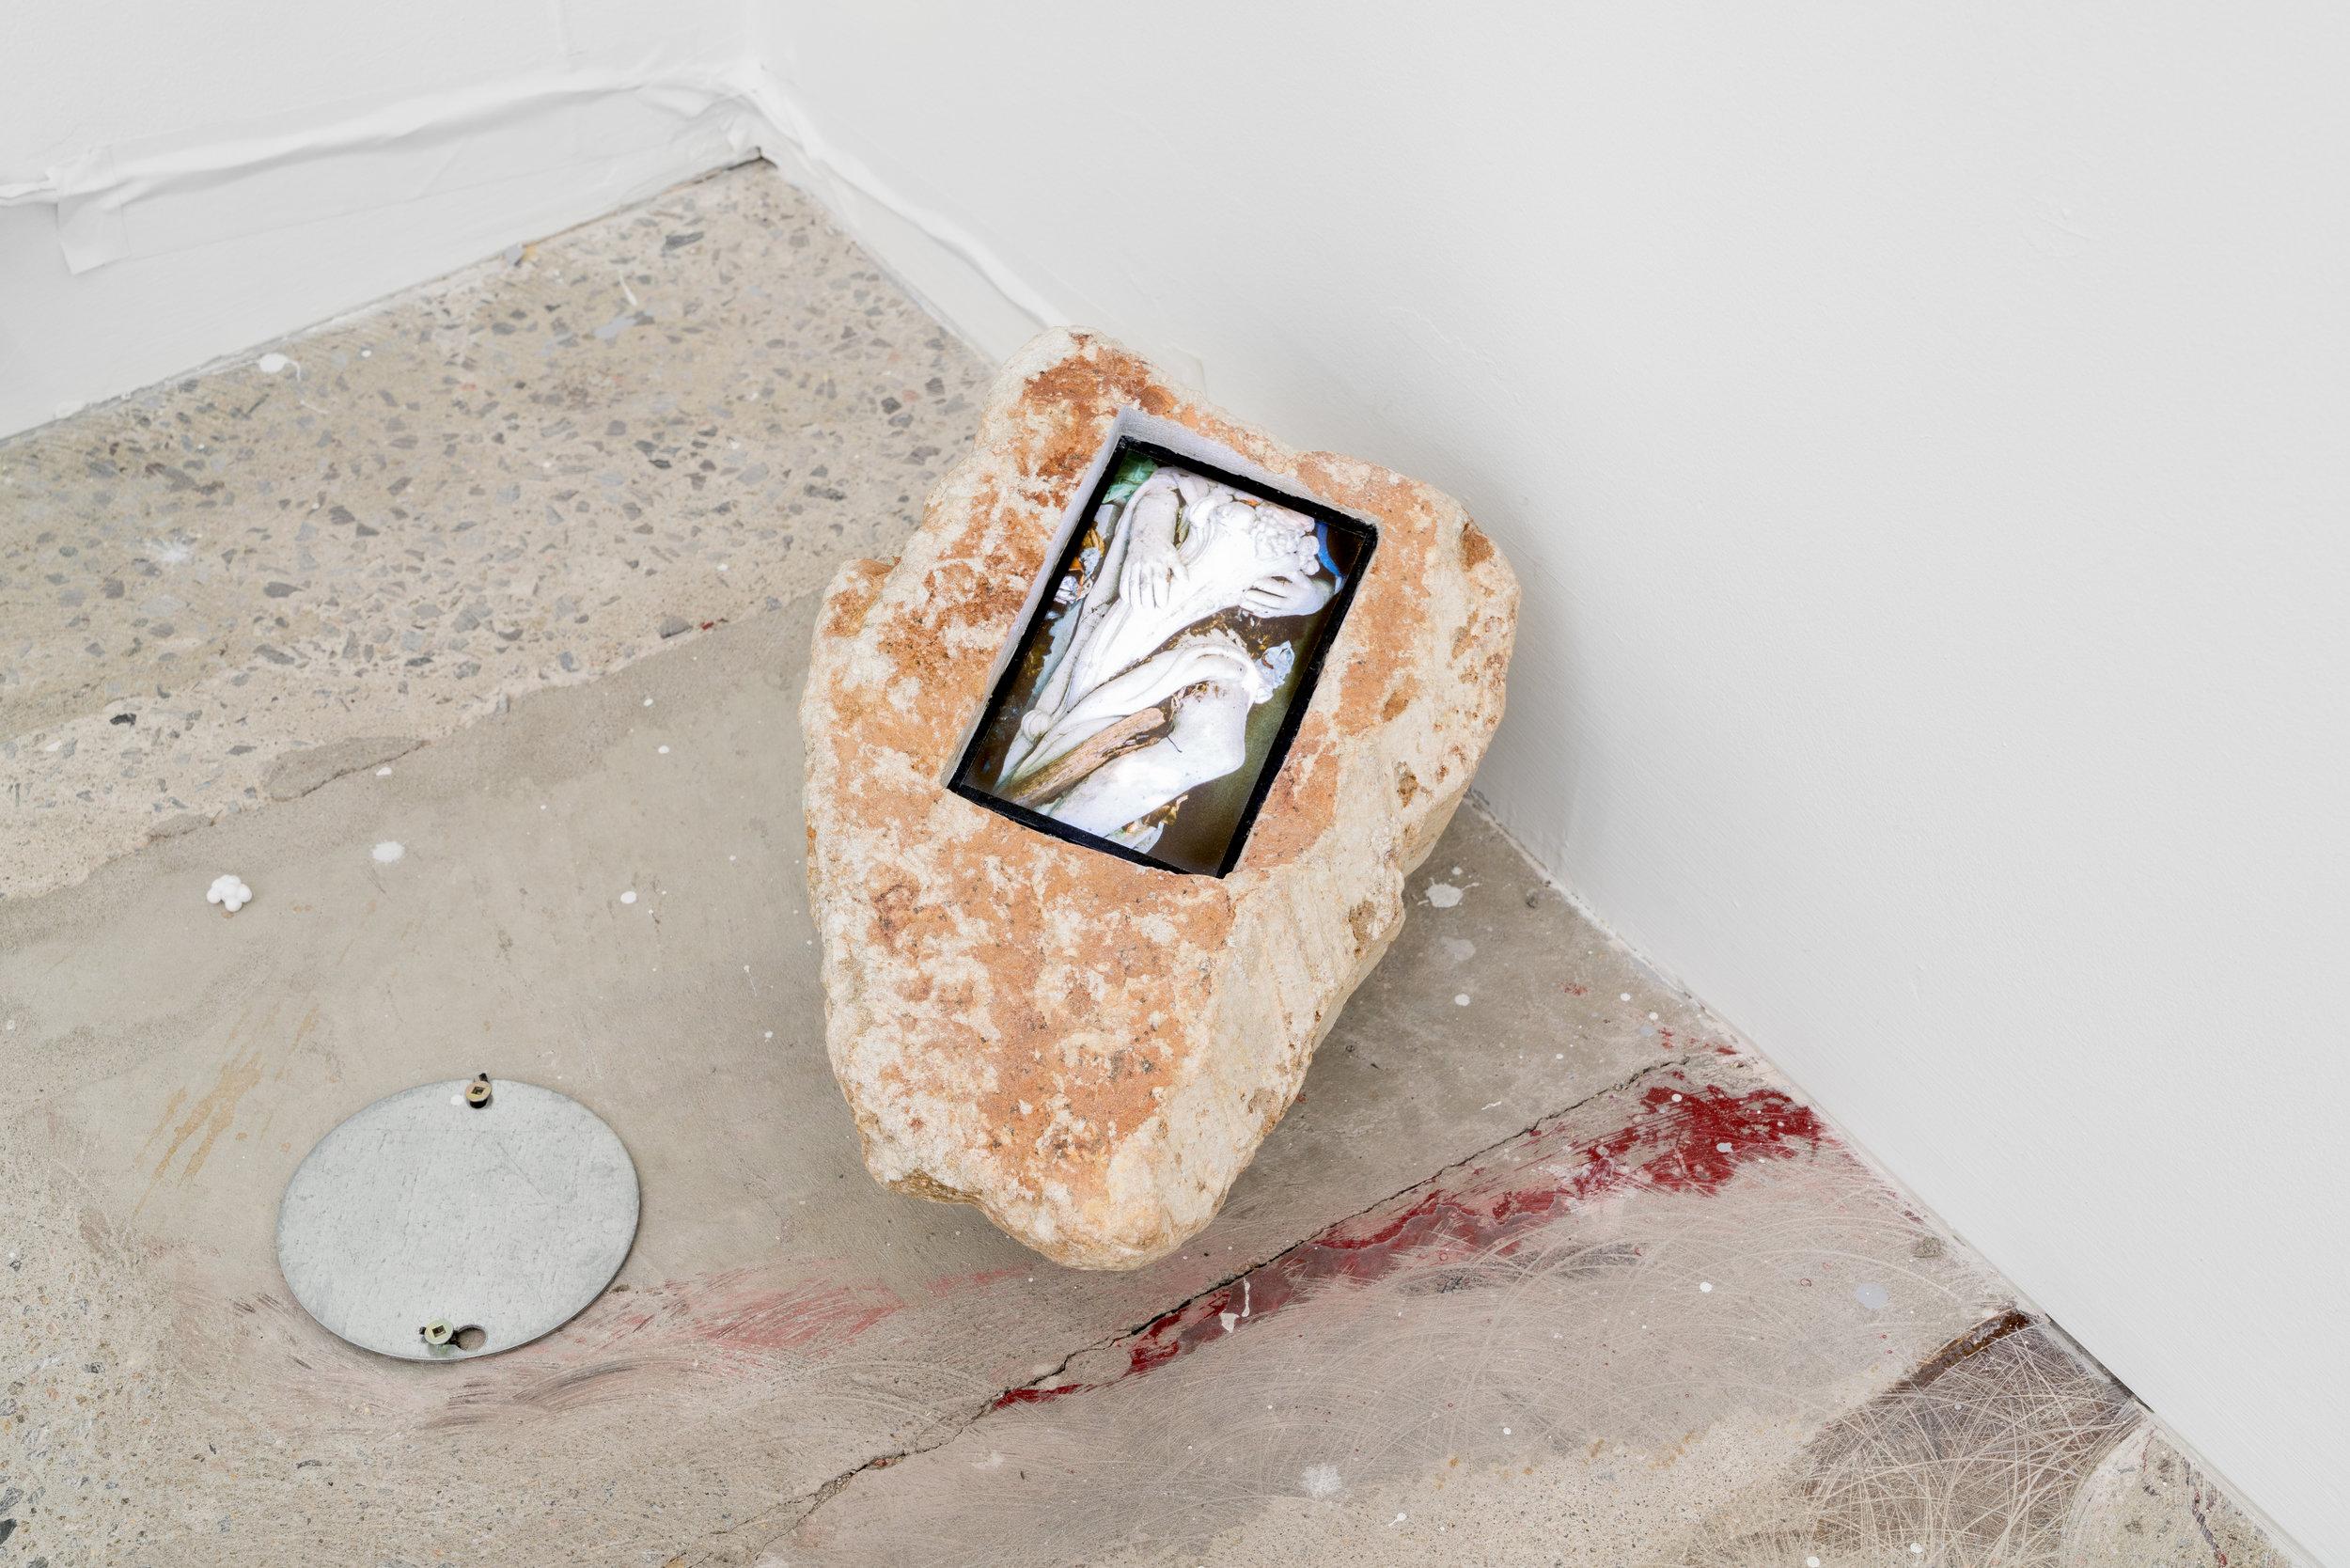 GalerieNicolasRobertNovembre2018 (15 of 27).jpg